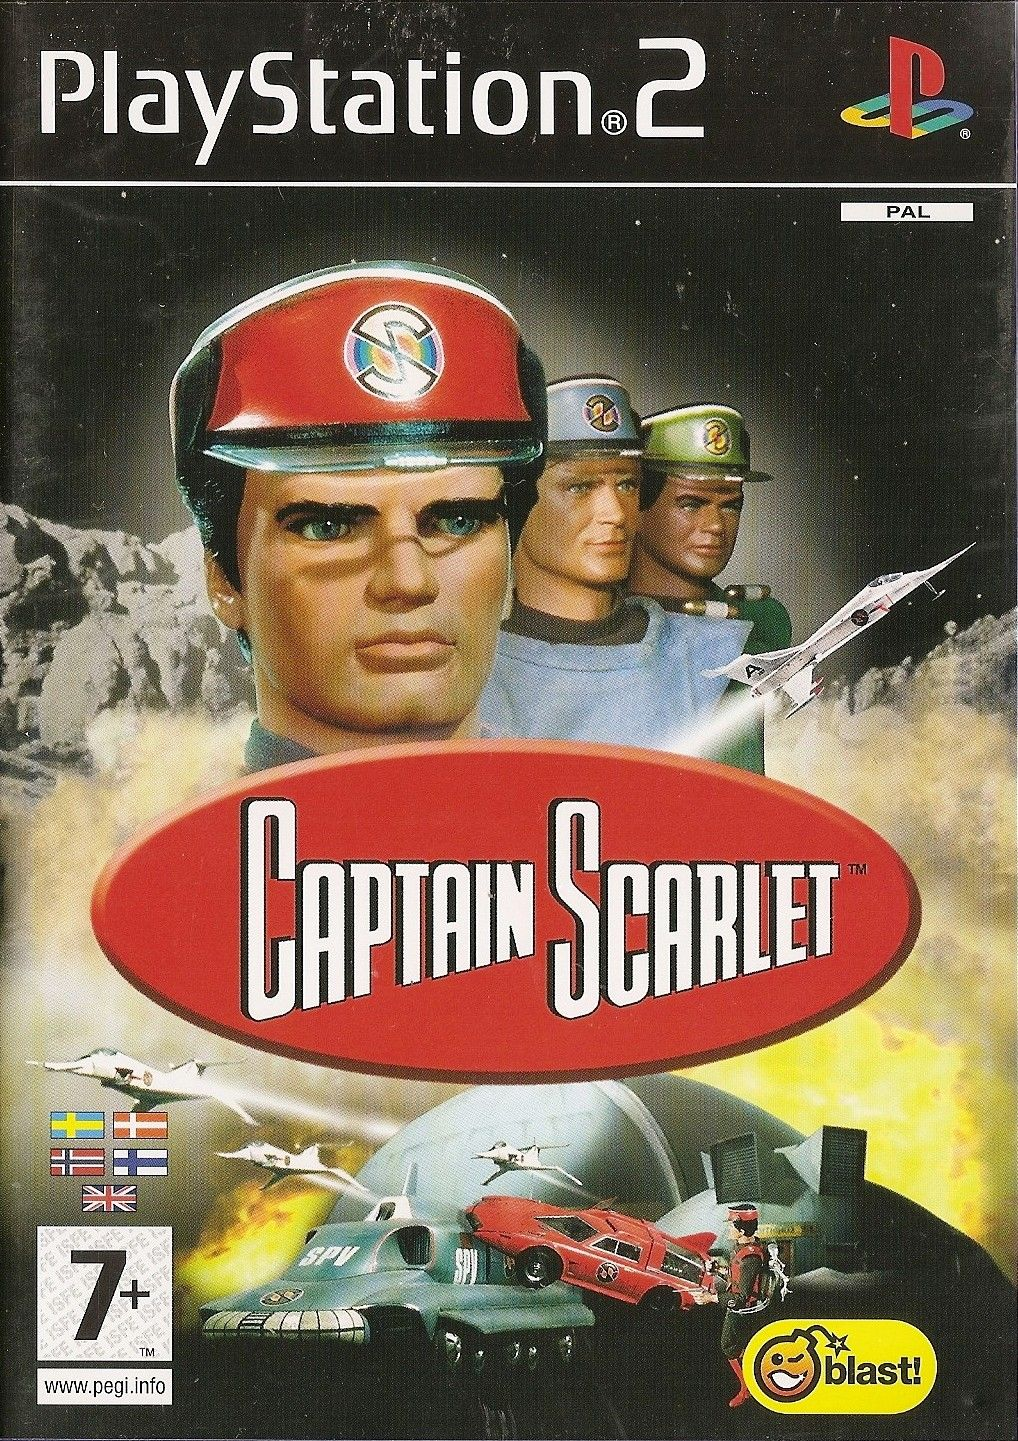 Captain Scarlet - PS2 - Playstation 2 - Blast! - 2006